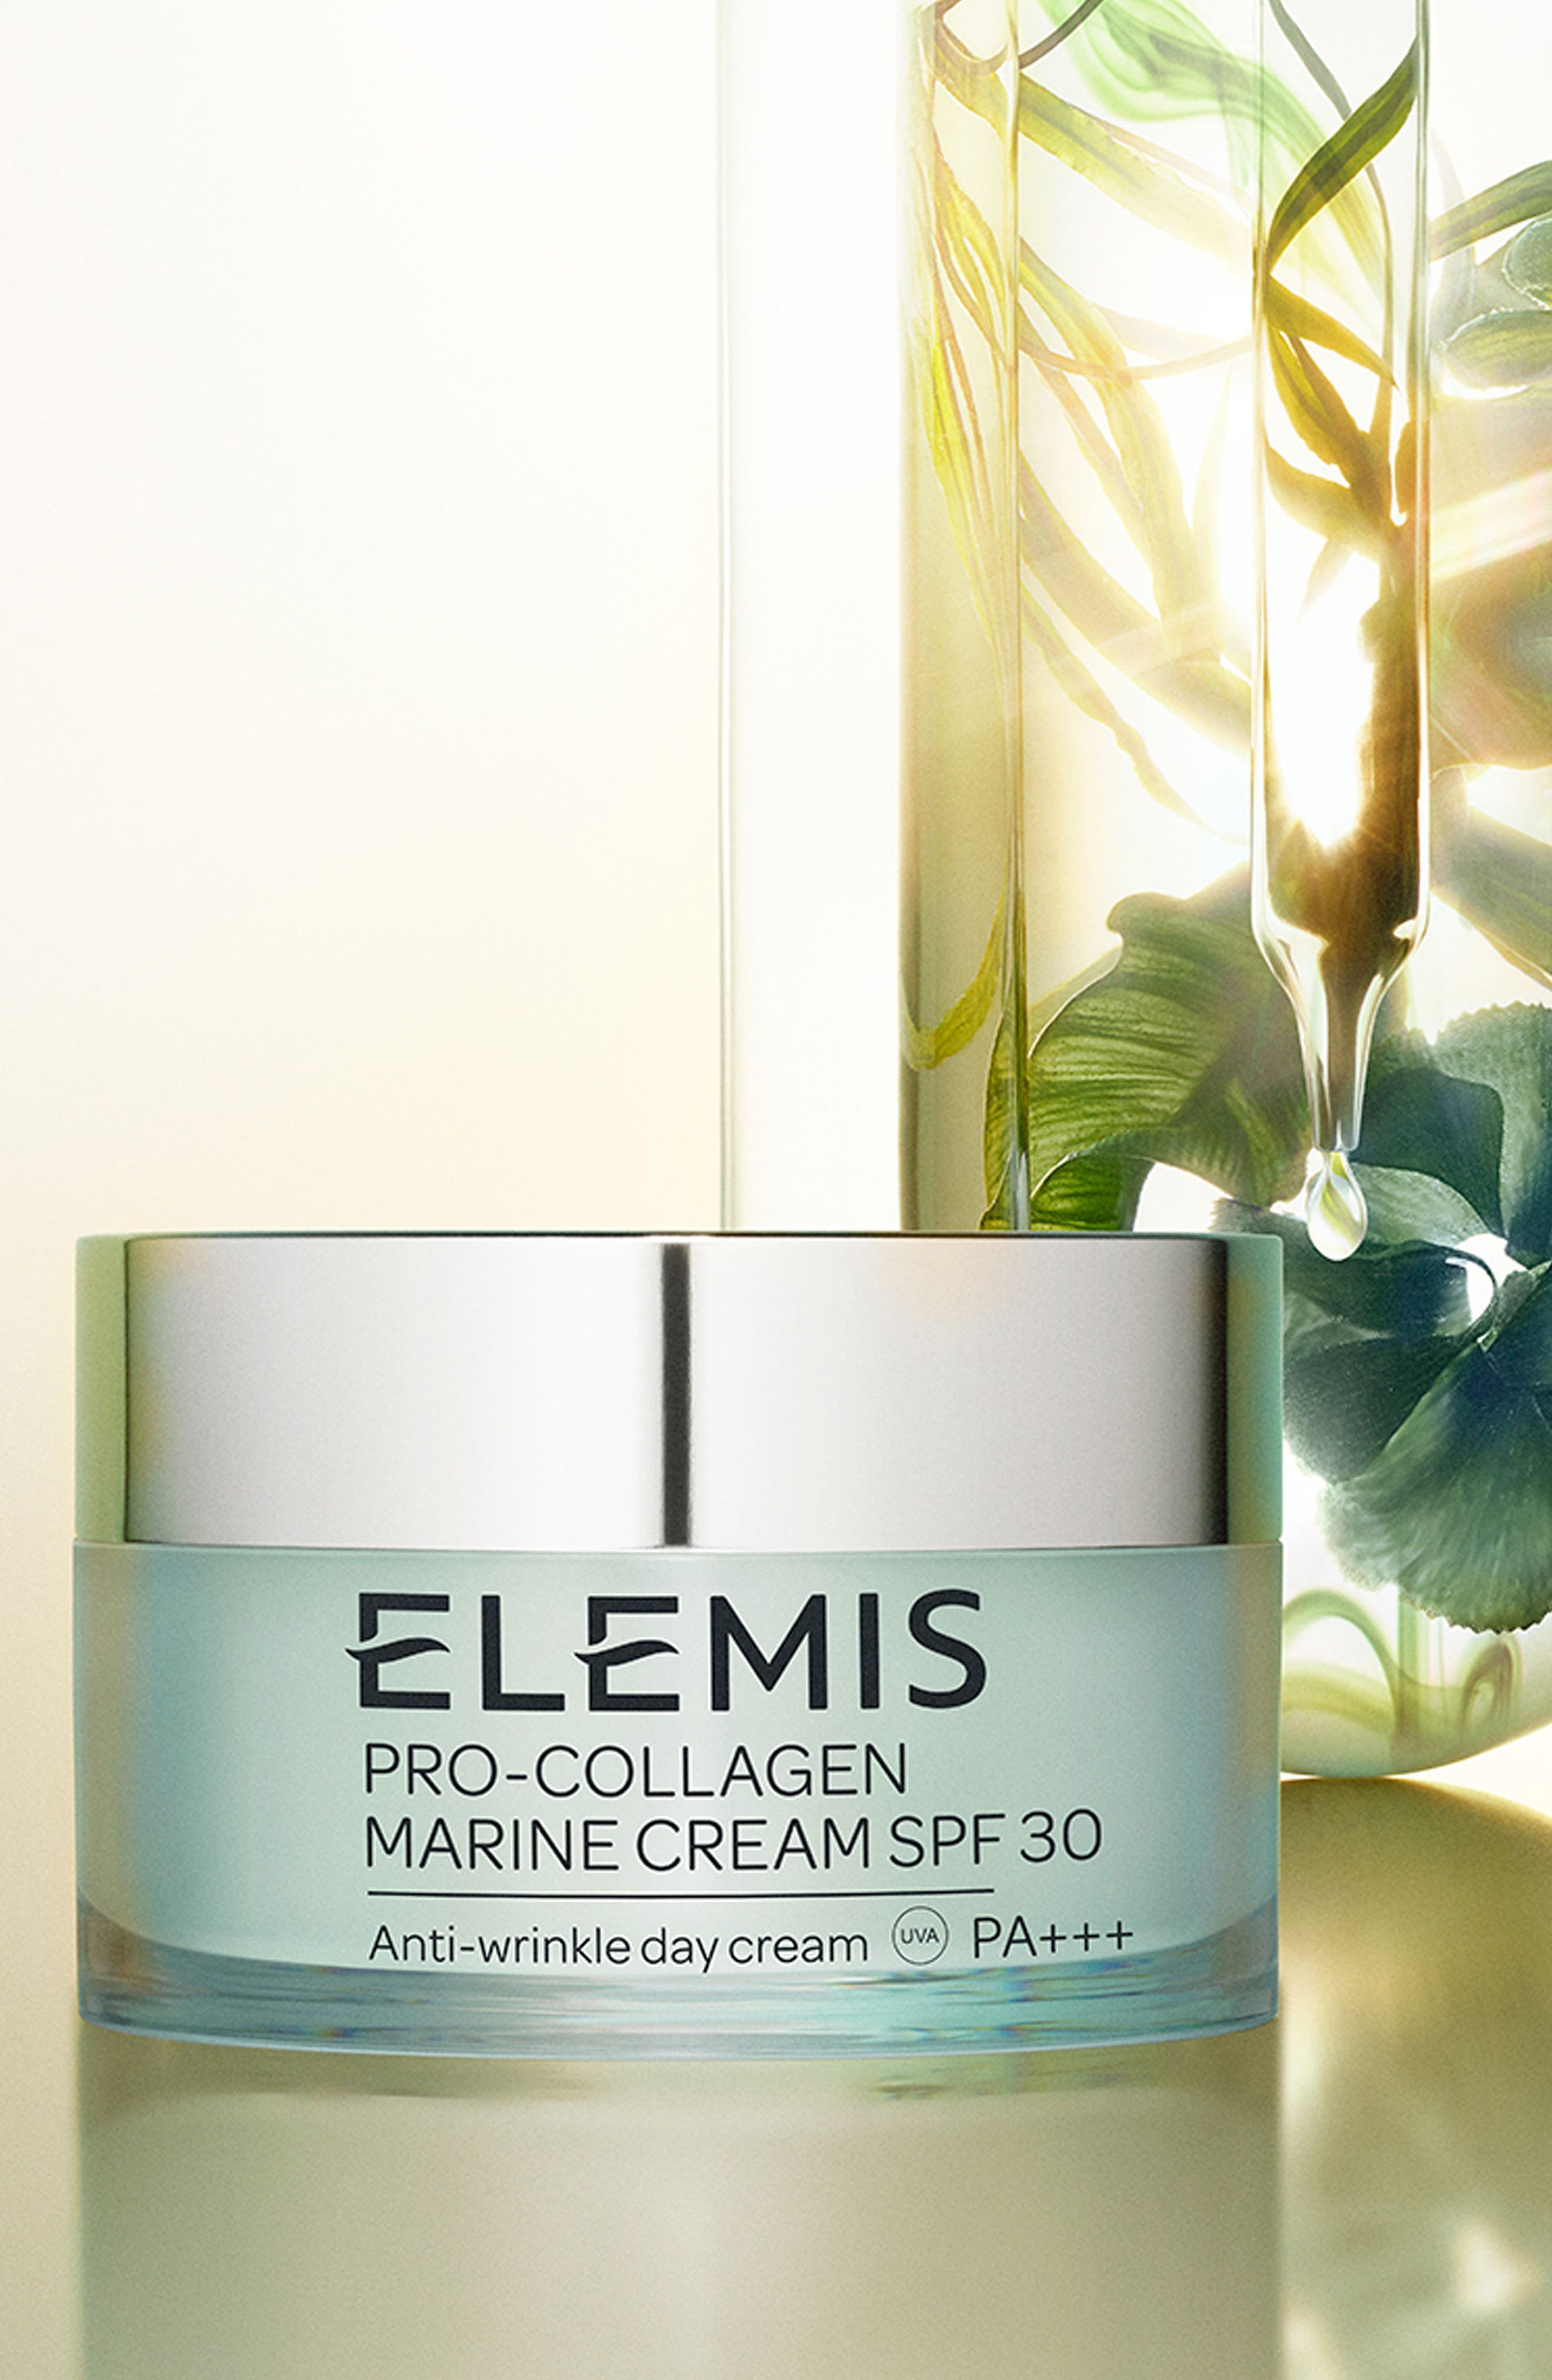 ELEMIS, Pro-Collagen Marine Cream SPF 30, Alternate thumbnail 2, color, NO COLOR